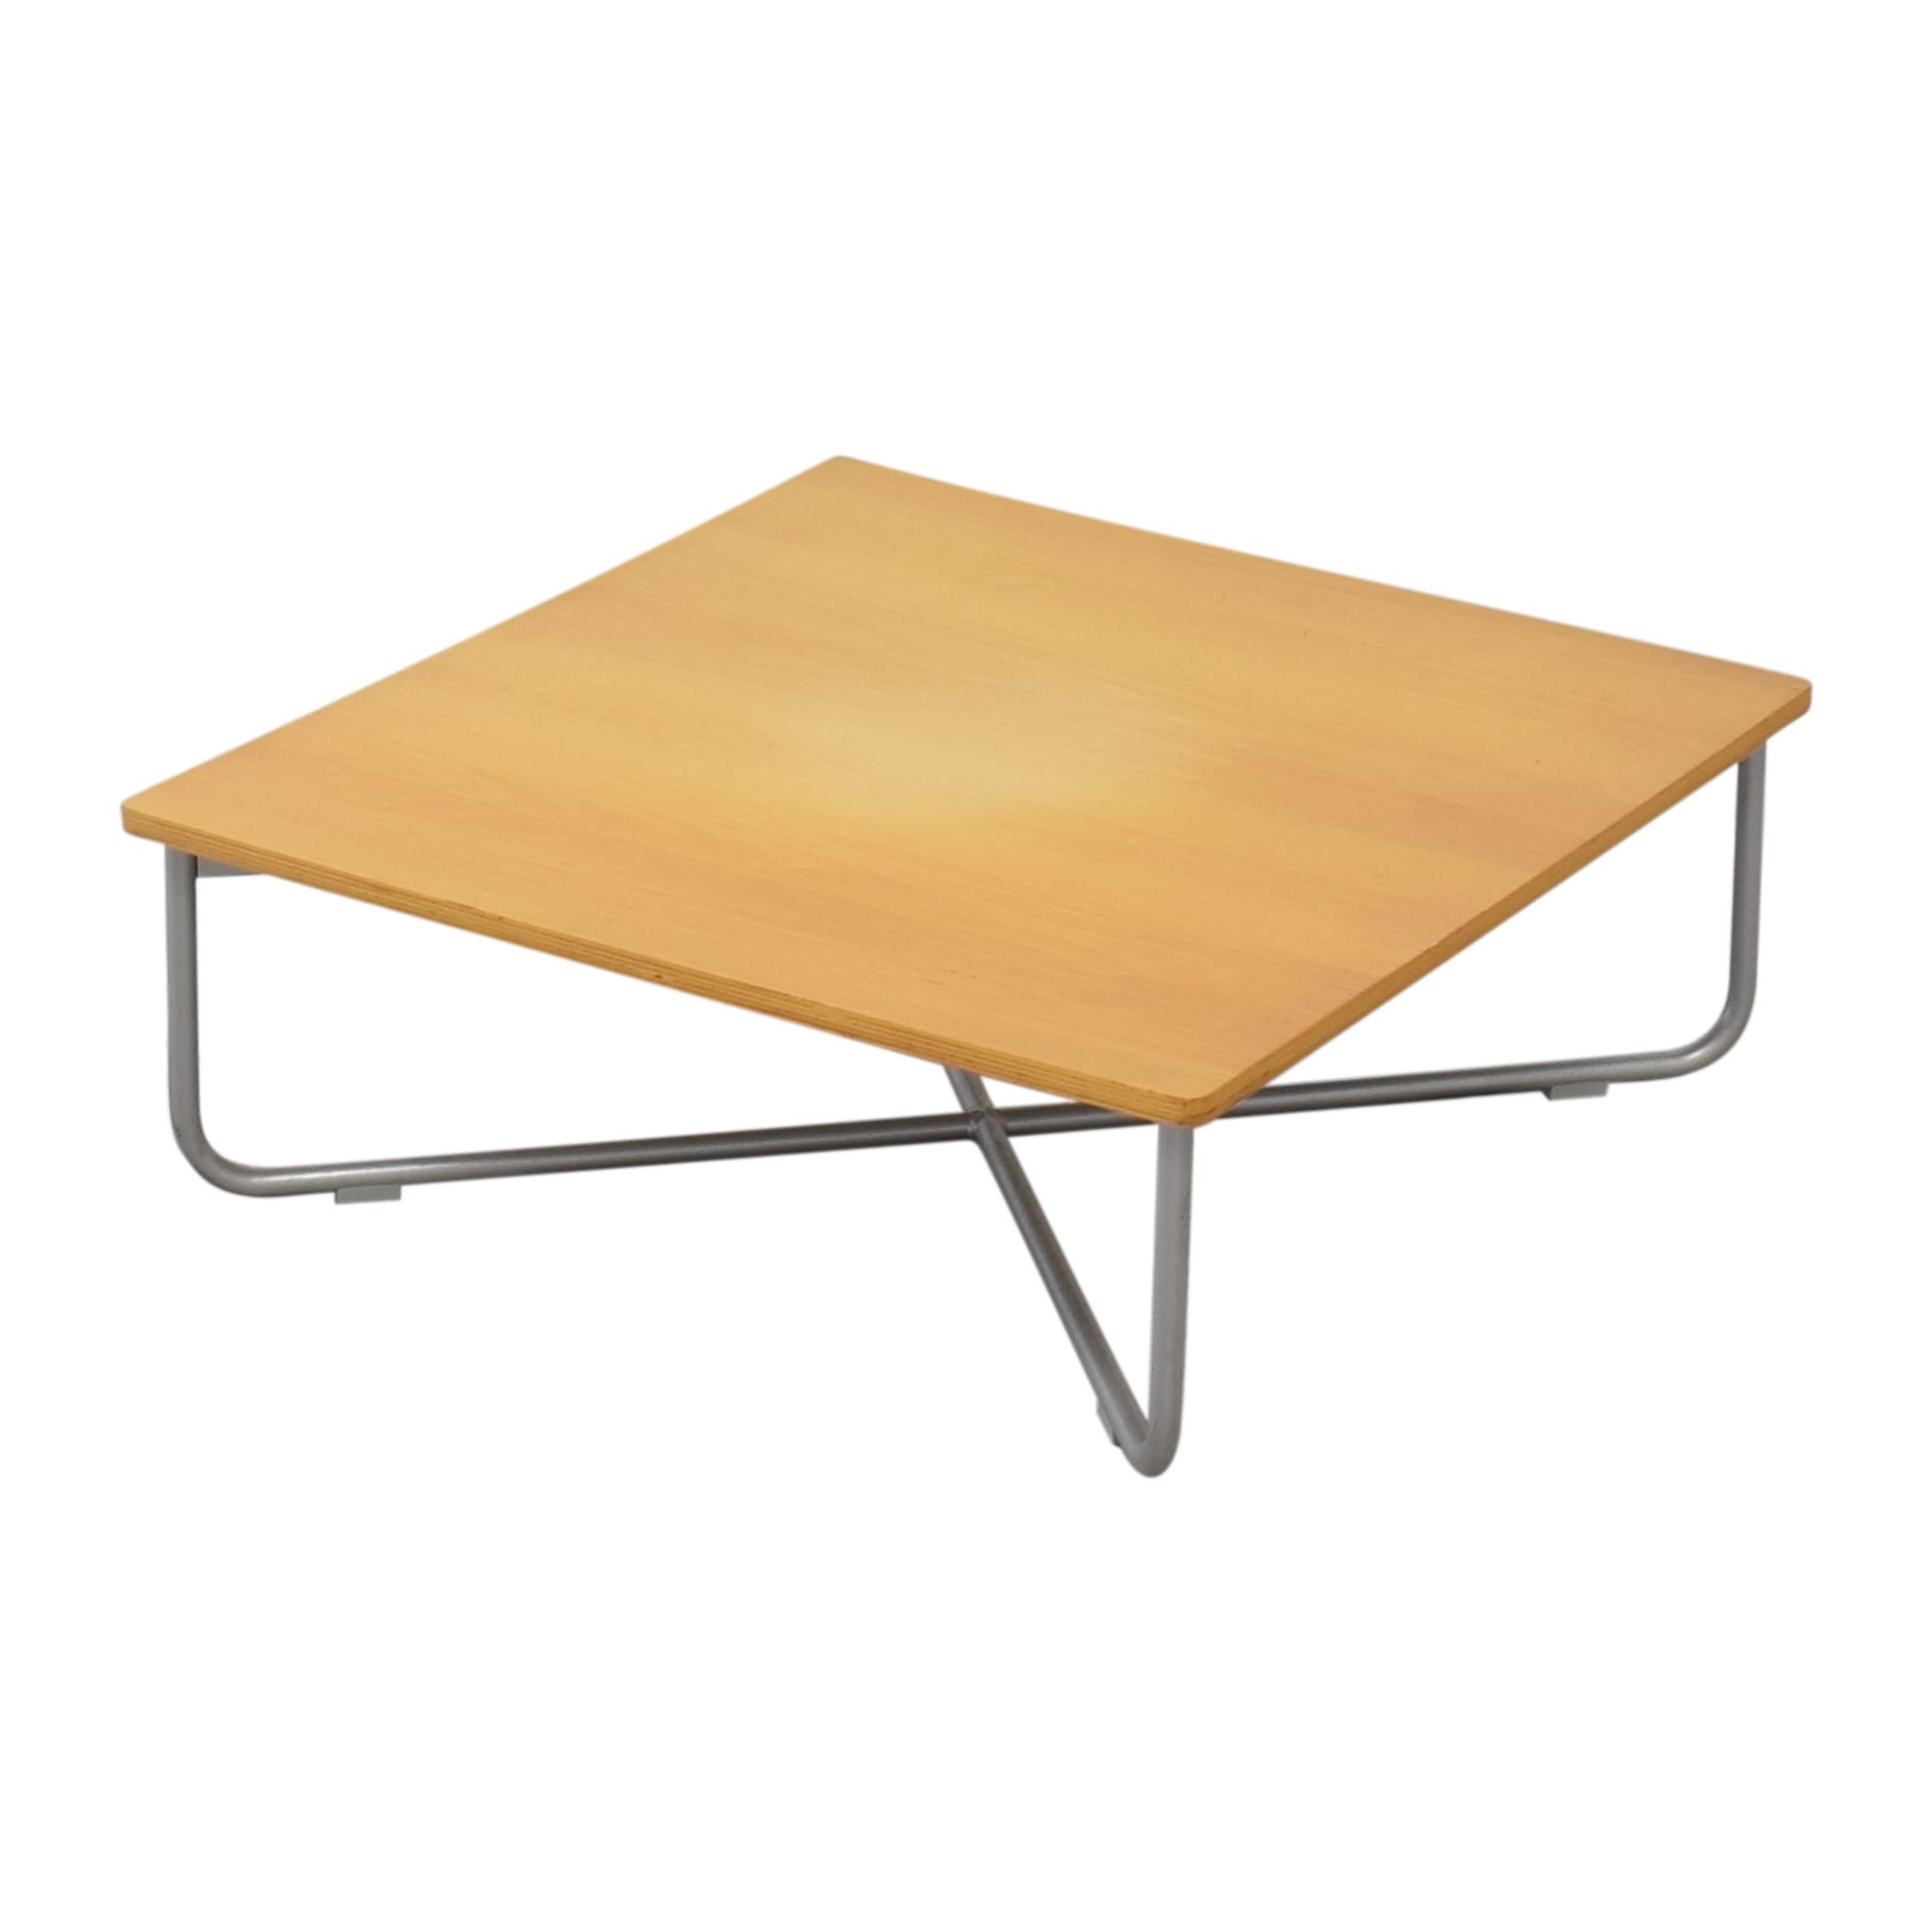 Swedese Swedese Havanna Small Table nj